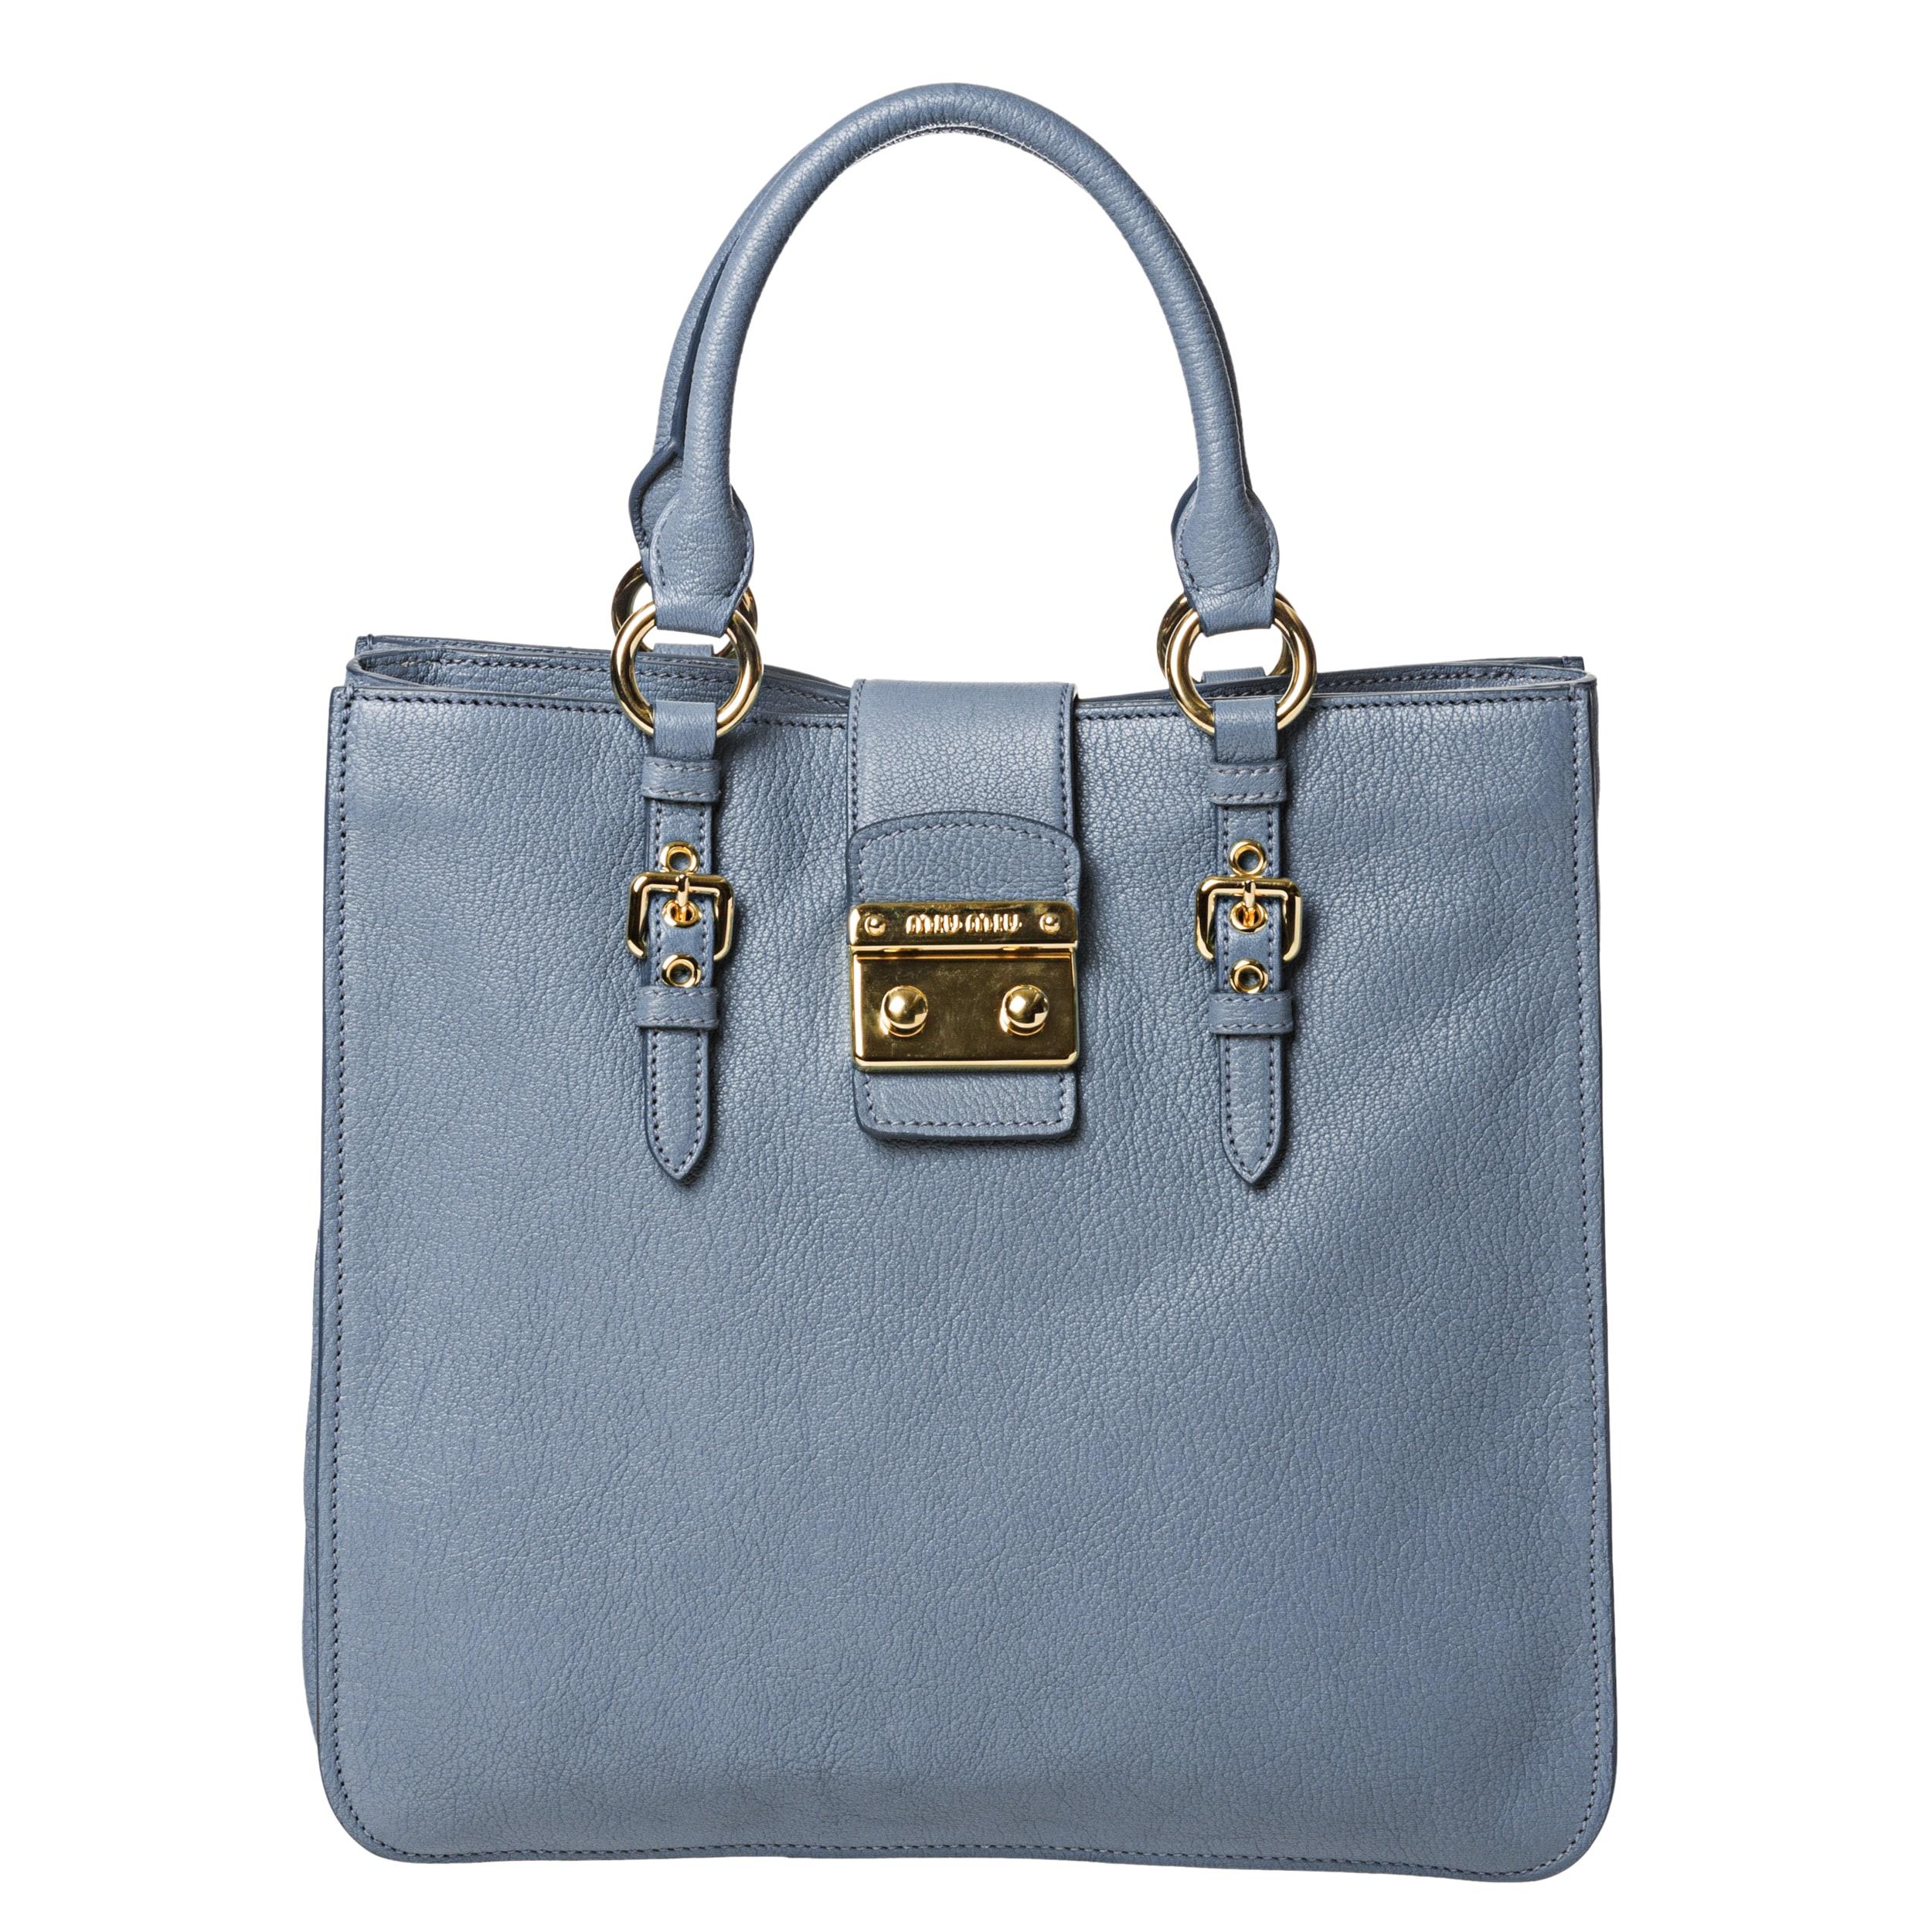 Miu Miu 'Madras' Sky Blue Leather Tote Bag